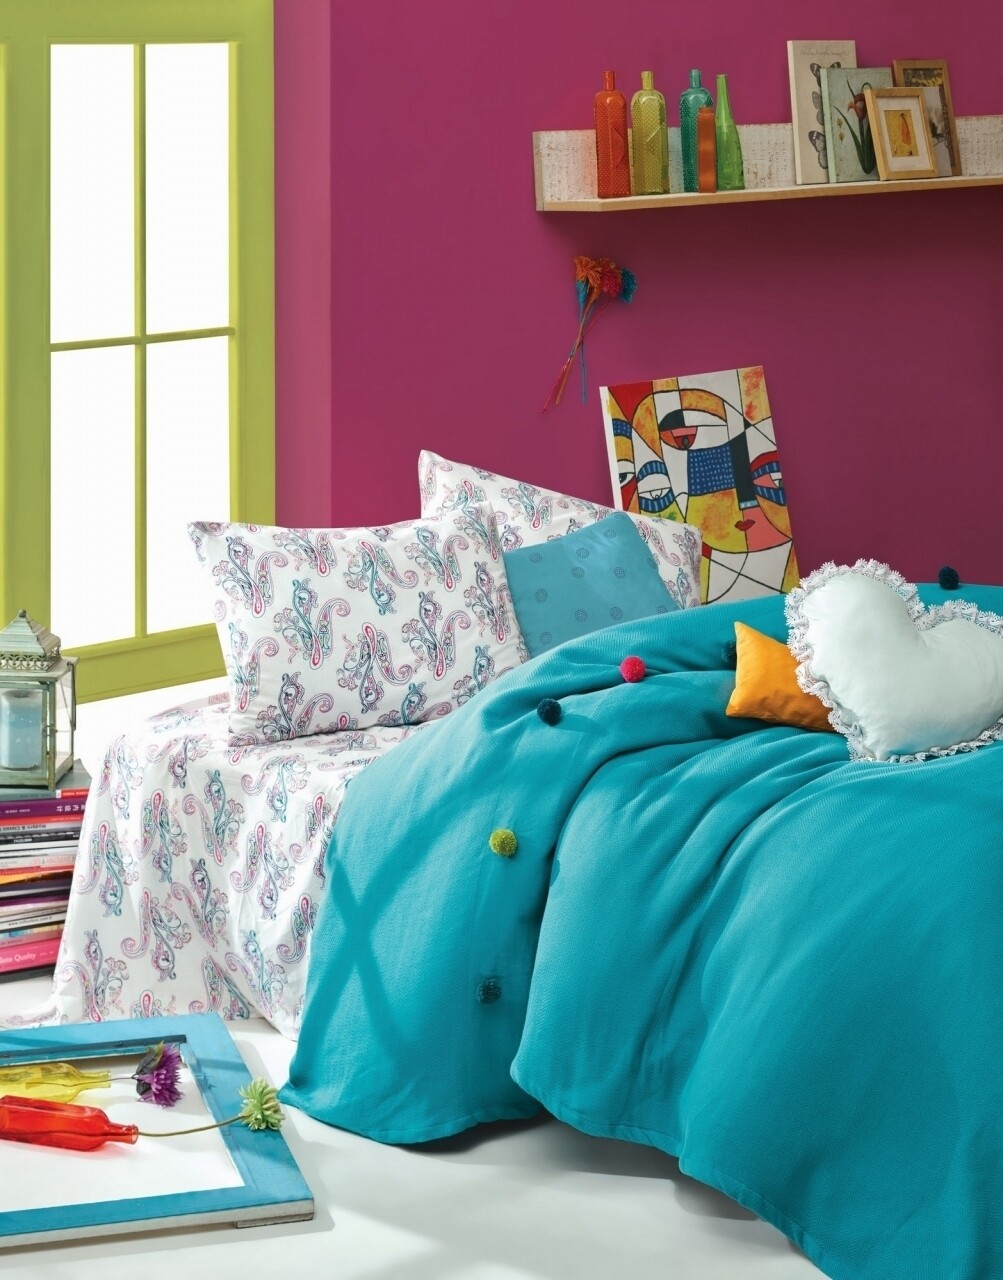 Set lenjerie de pat + cuvertura pentru o persoana Fancy Blue, Cotton Box, 3 piese, 160 x 230 cm, 100% bumbac ranforce, albastru